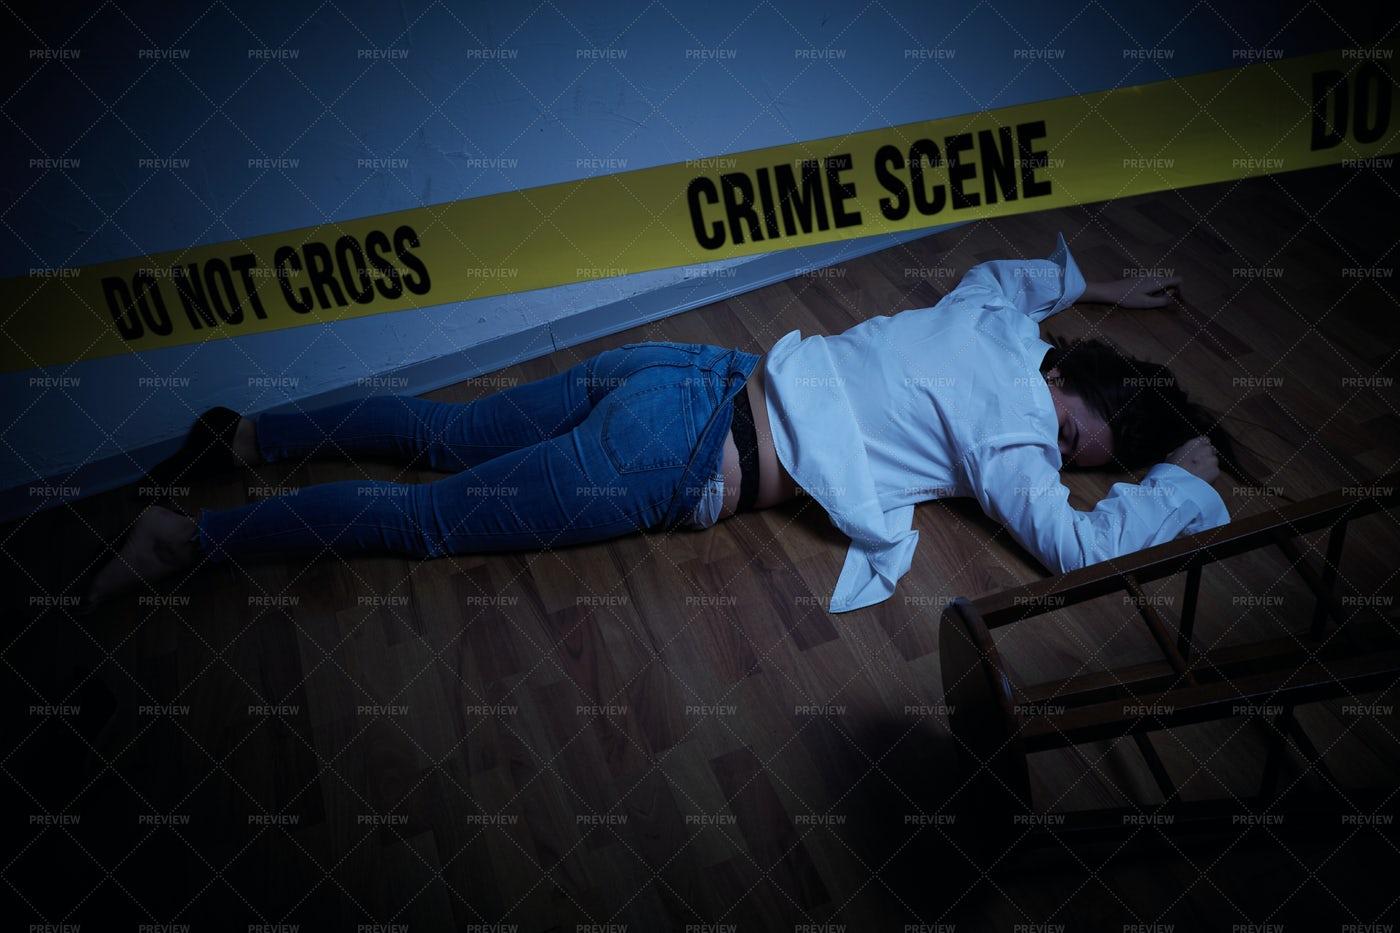 Woman Assassinated: Stock Photos